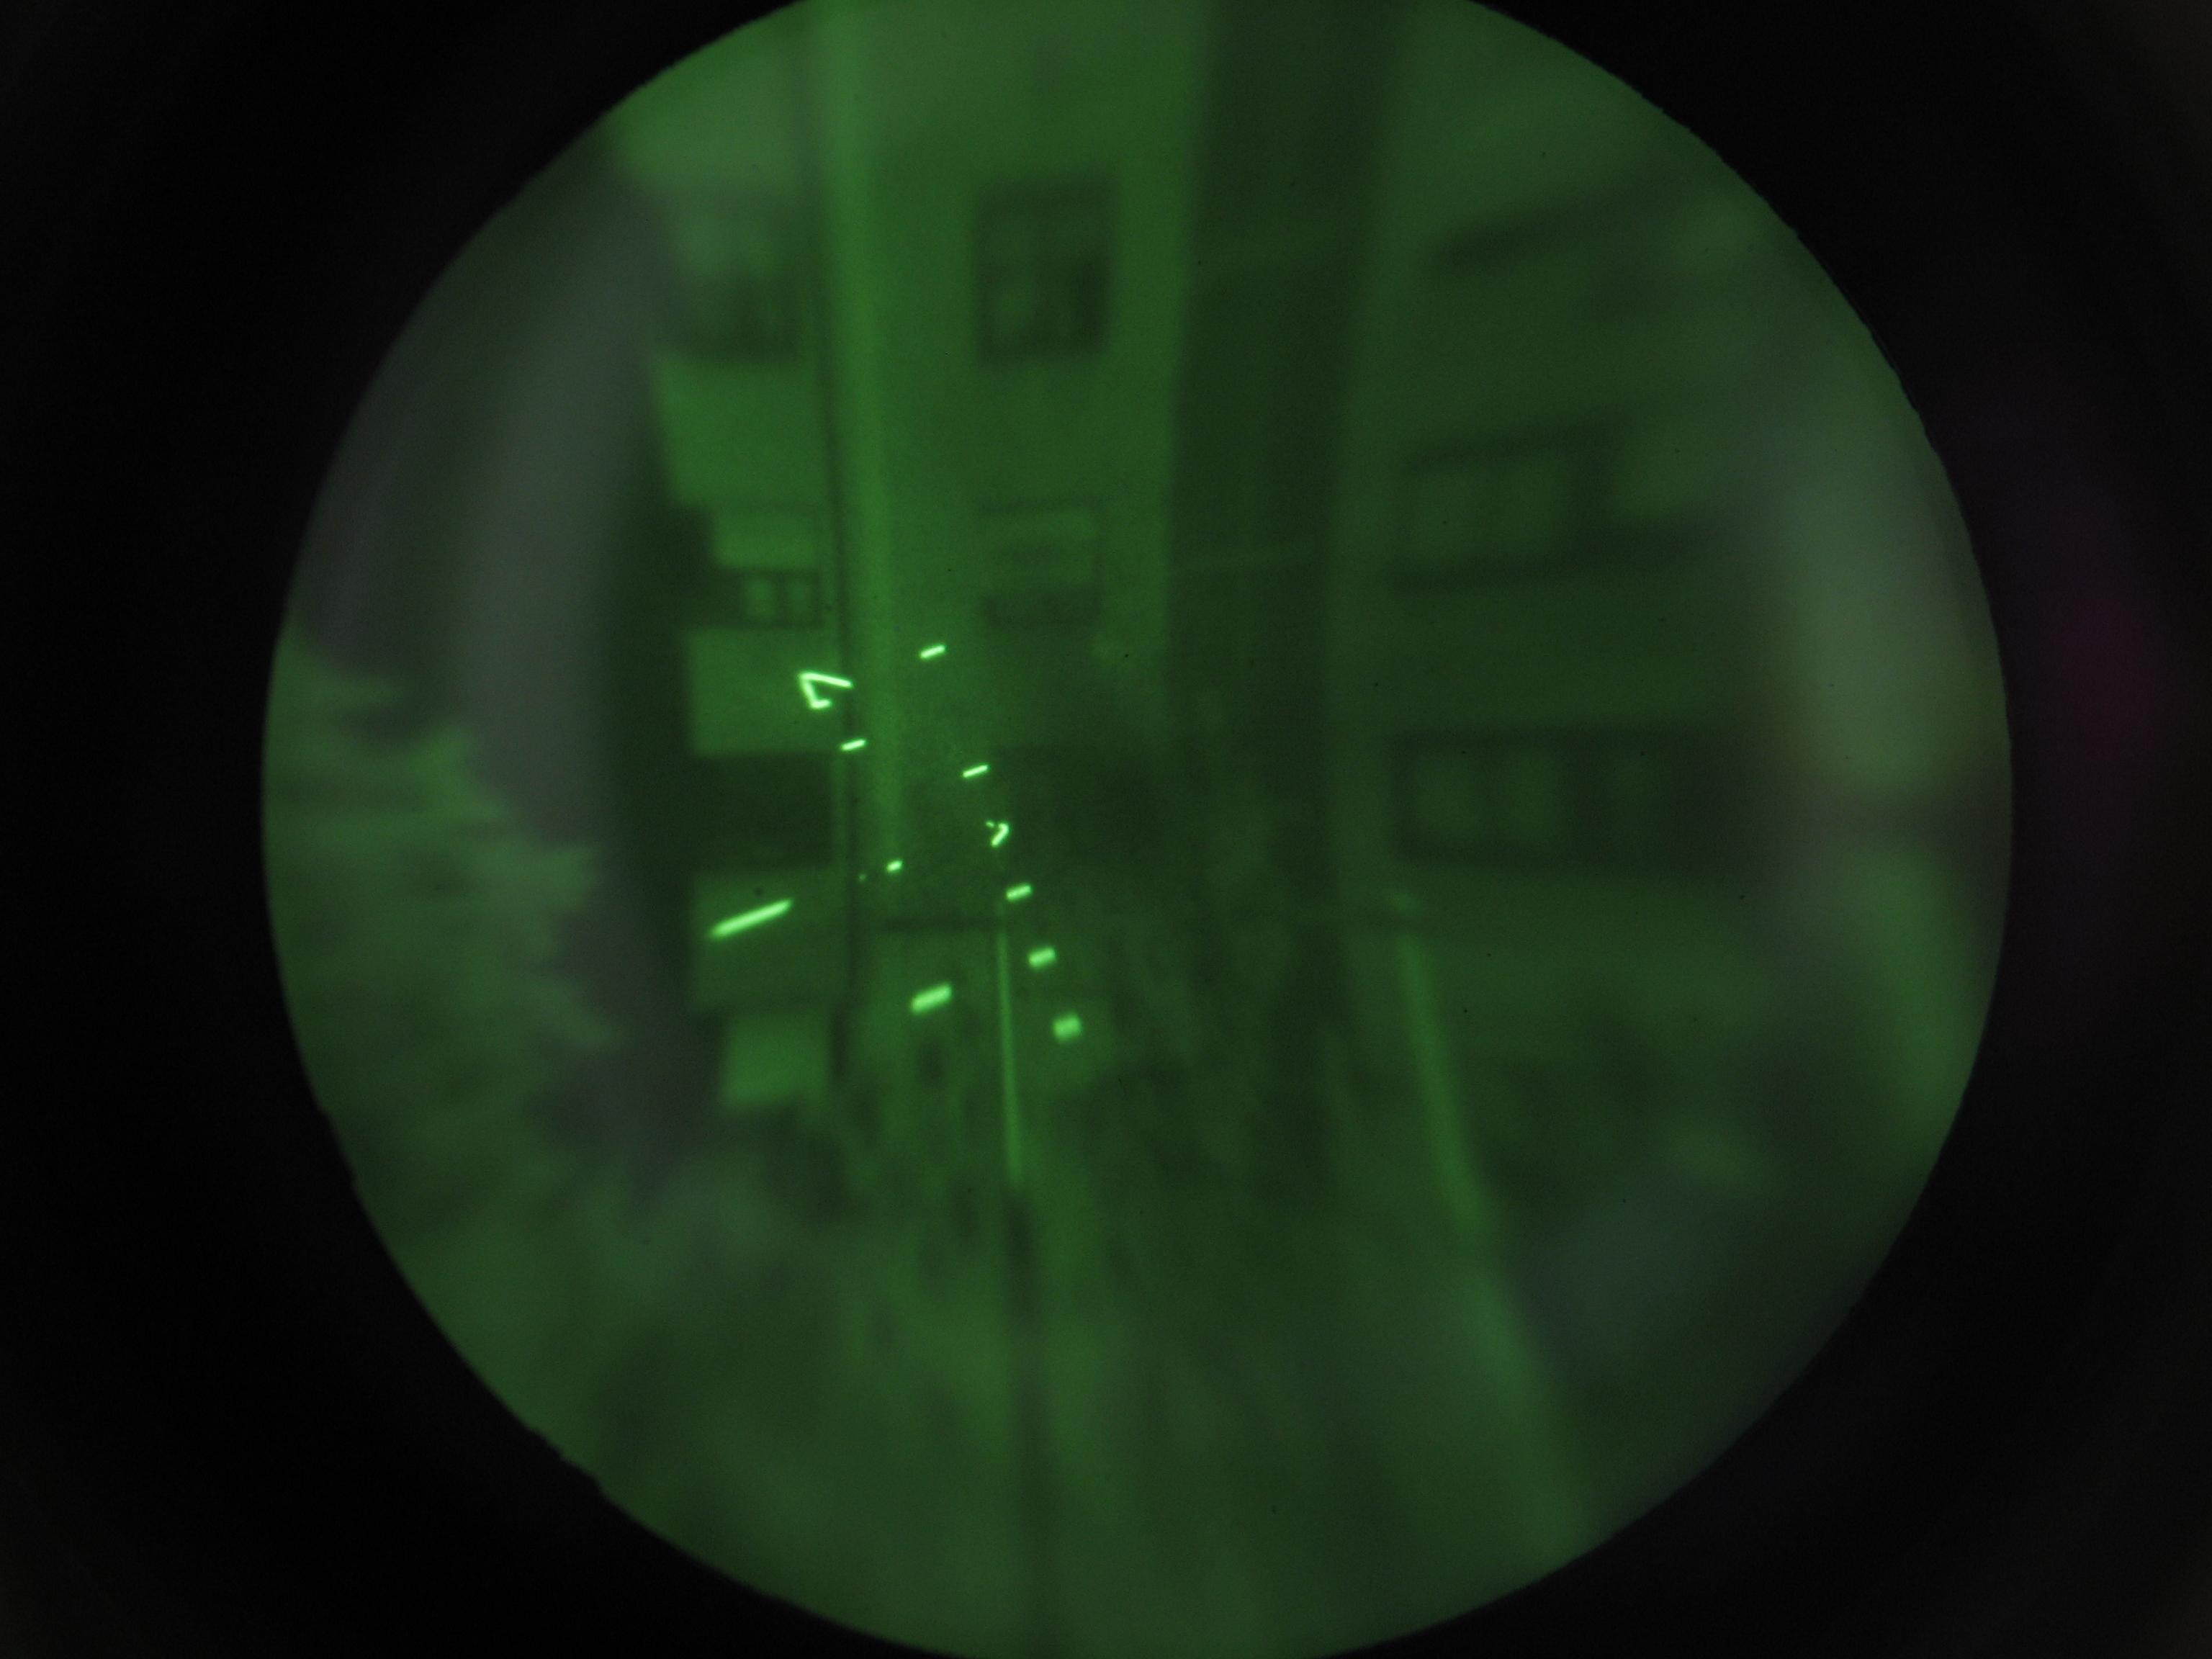 Mira telescópica de visión nocturna NSPU 1PN34 (НСПУ 1ПН34 ...